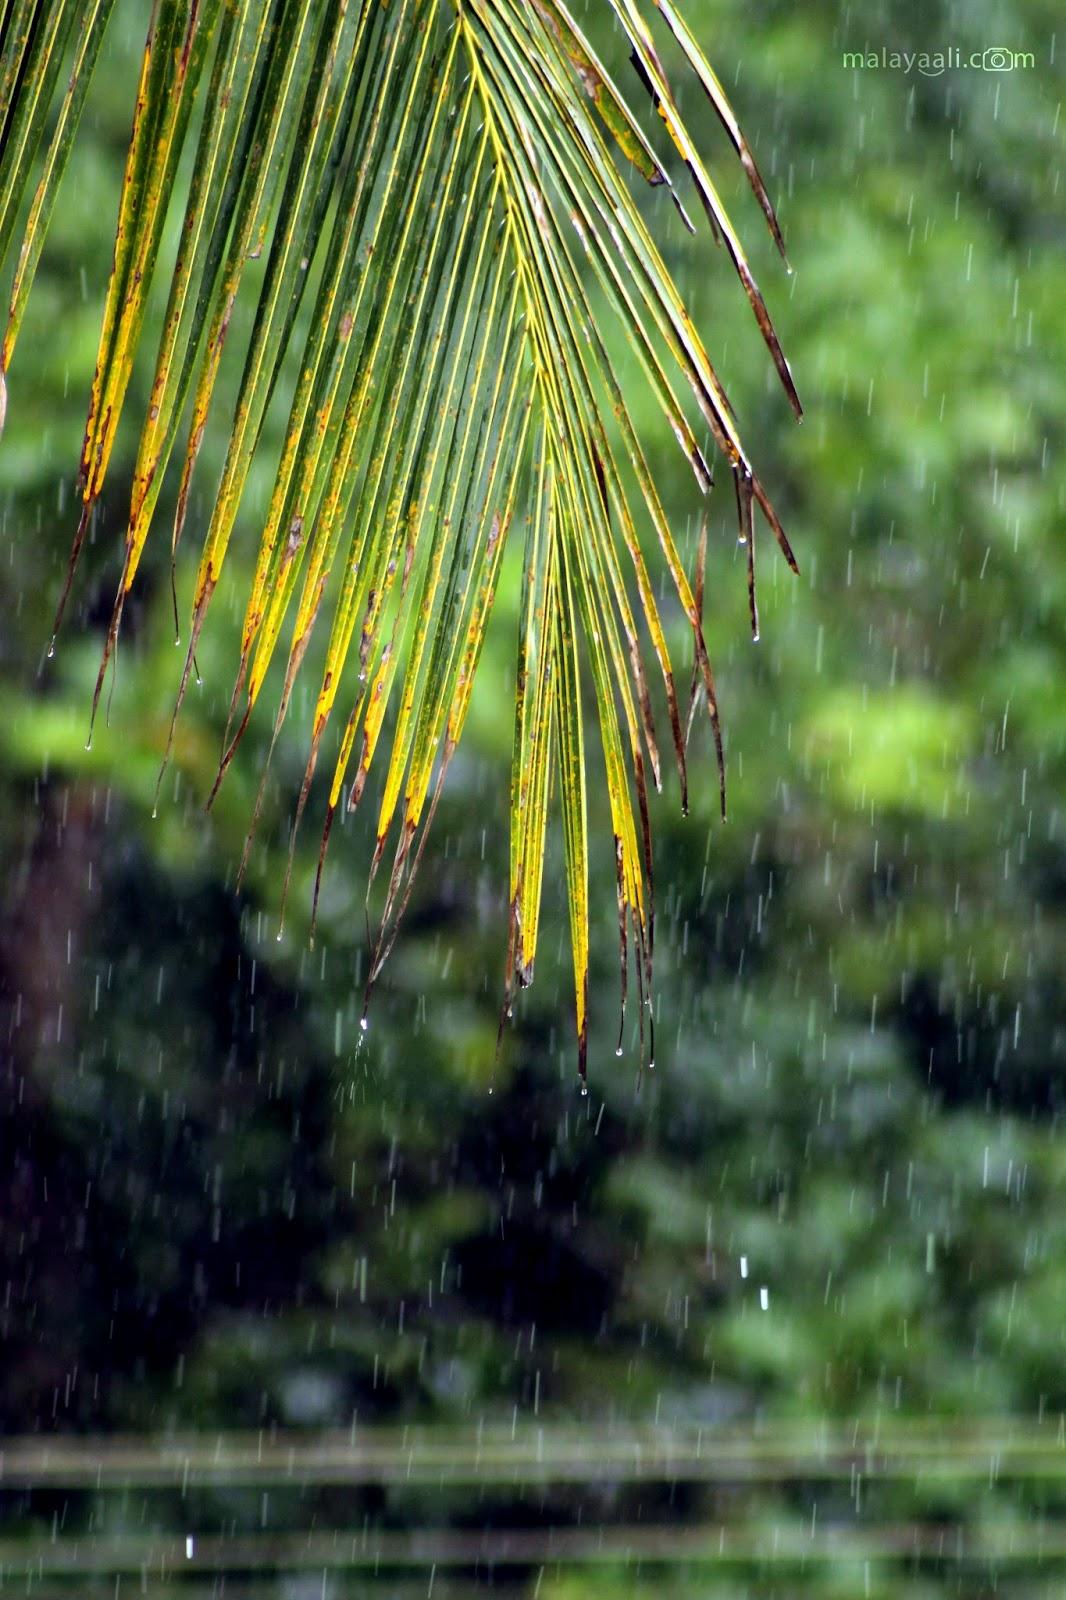 Malayali Peringode, Mazha, Monsoon, Rain, Kerala, മലയാളി പെരിങ്ങോട്, മഴ, മഴക്കാലം, മഴചിത്രം, സുകൃതം, Sukrutham